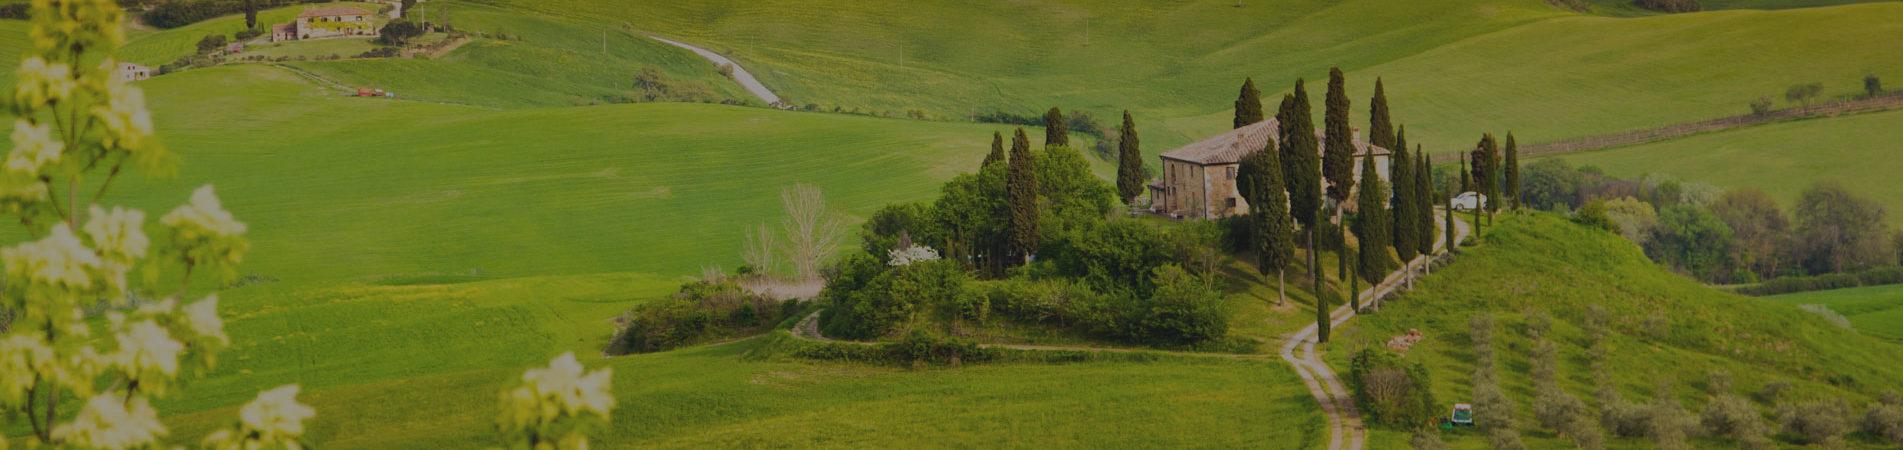 Tuscany Wide